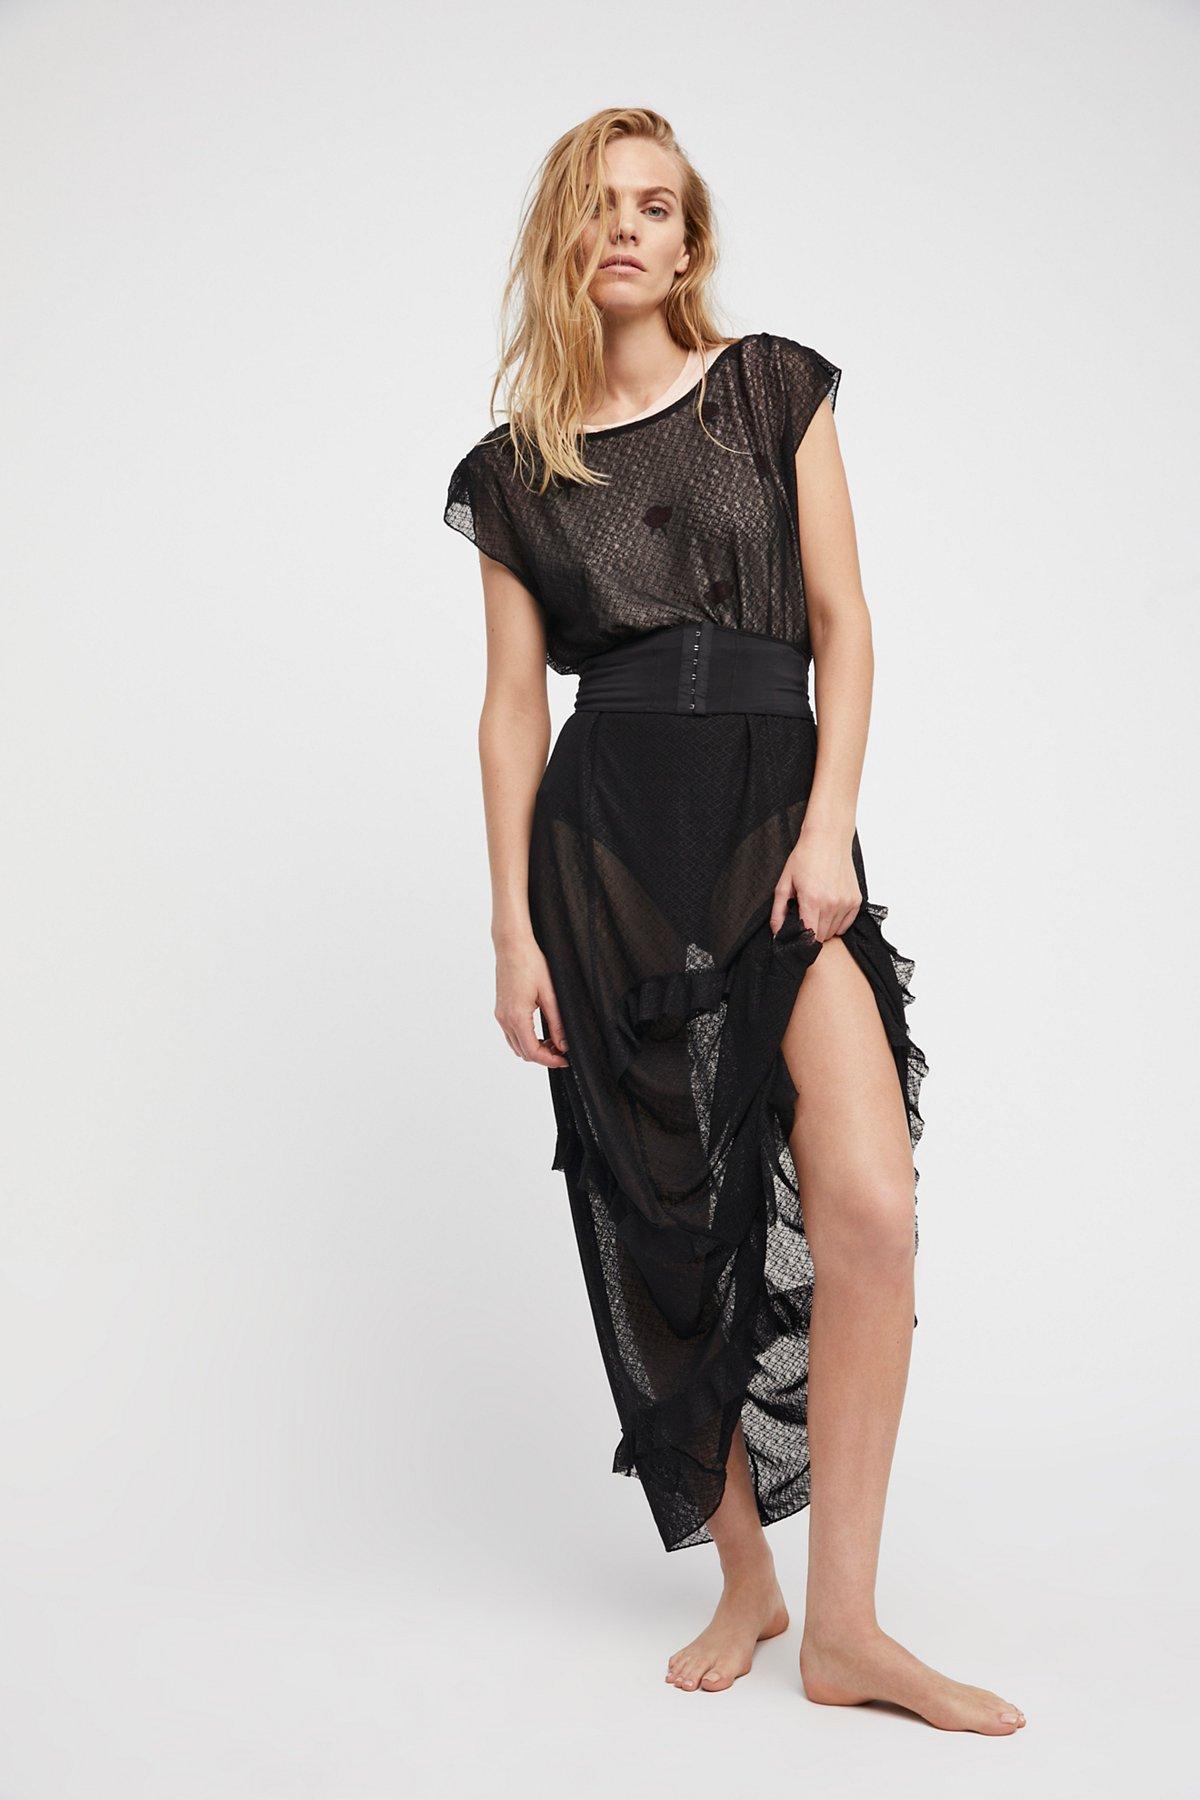 Corset Is,长衬裙